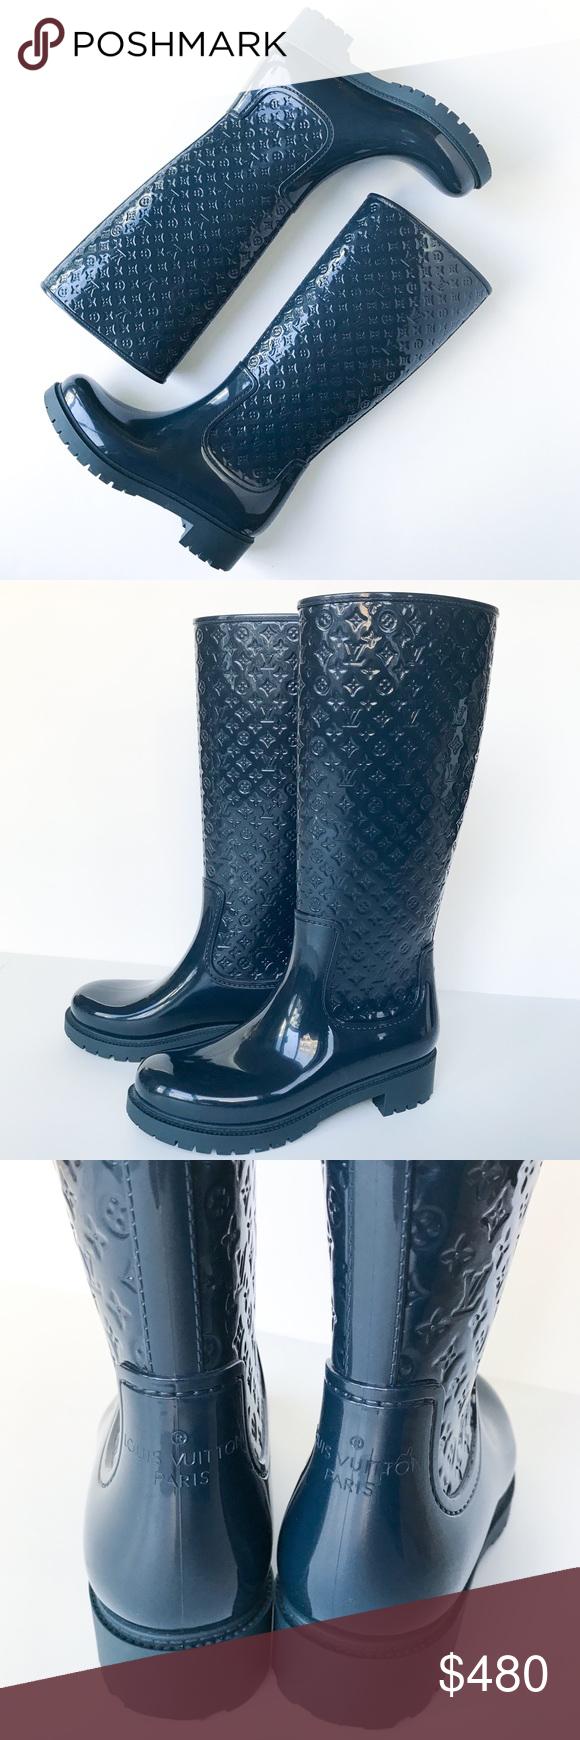 4cbd27988ce Louis Vuitton • navy monogram rain boots Elegant pair of rain boots! The  high-